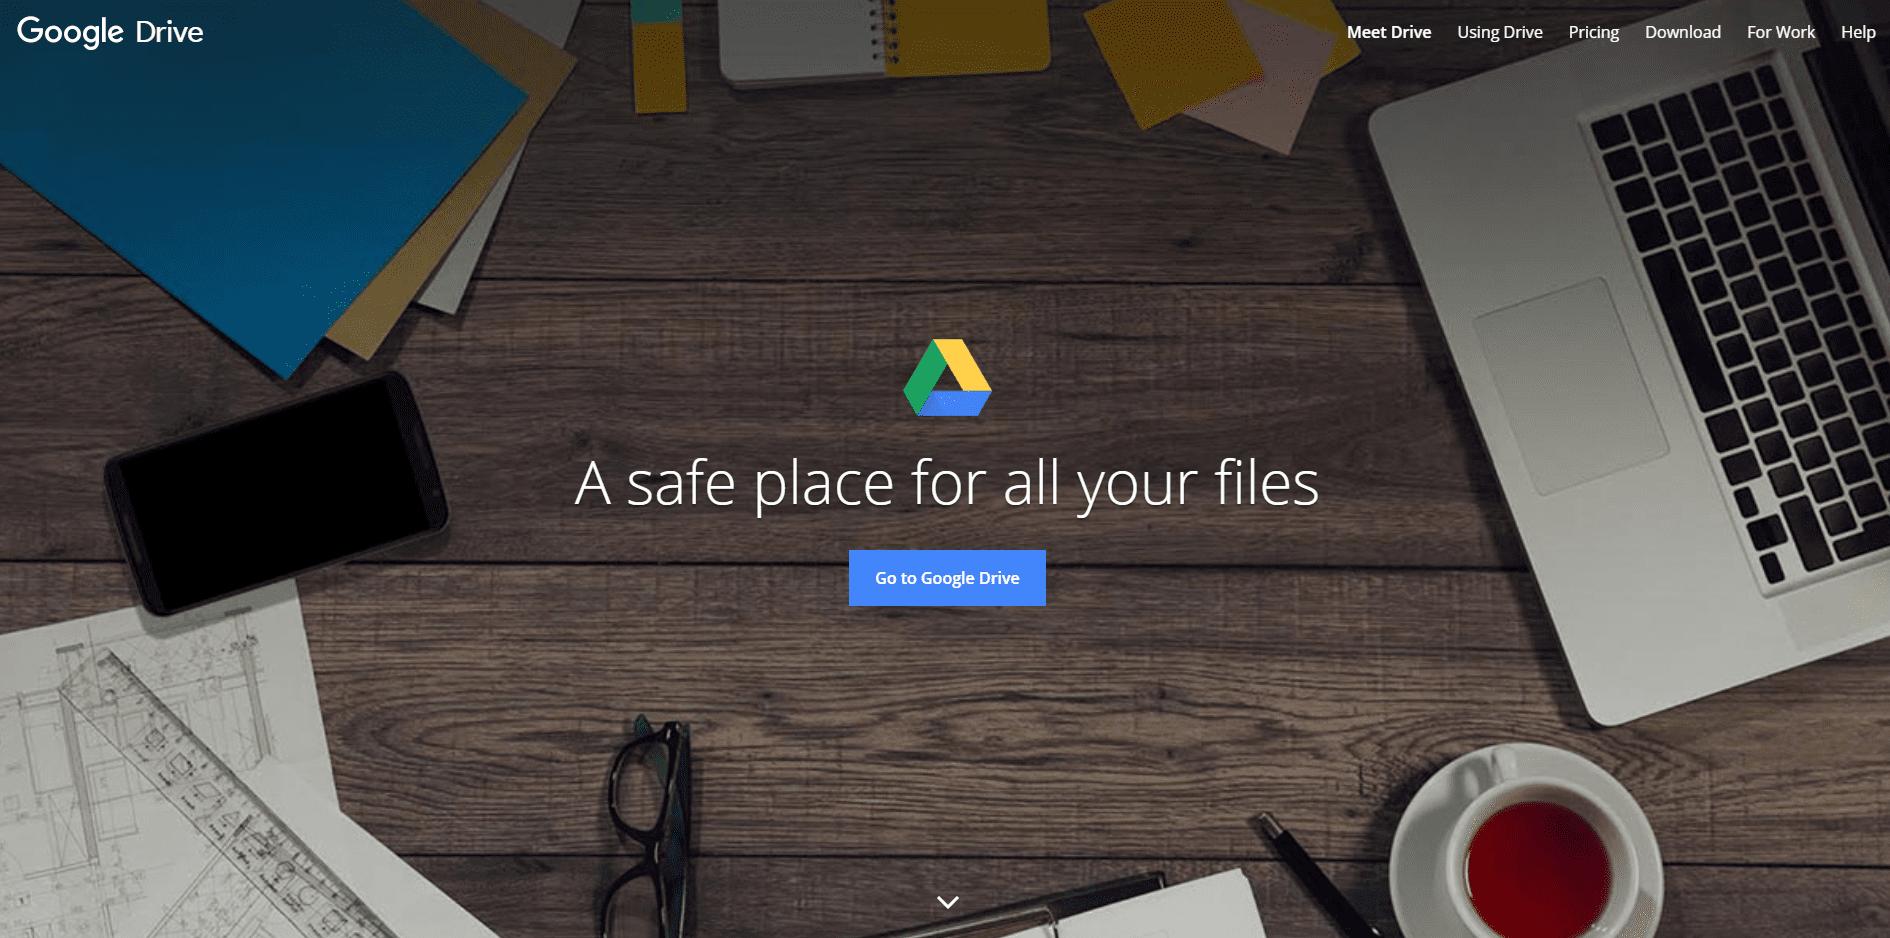 google drive landing page design